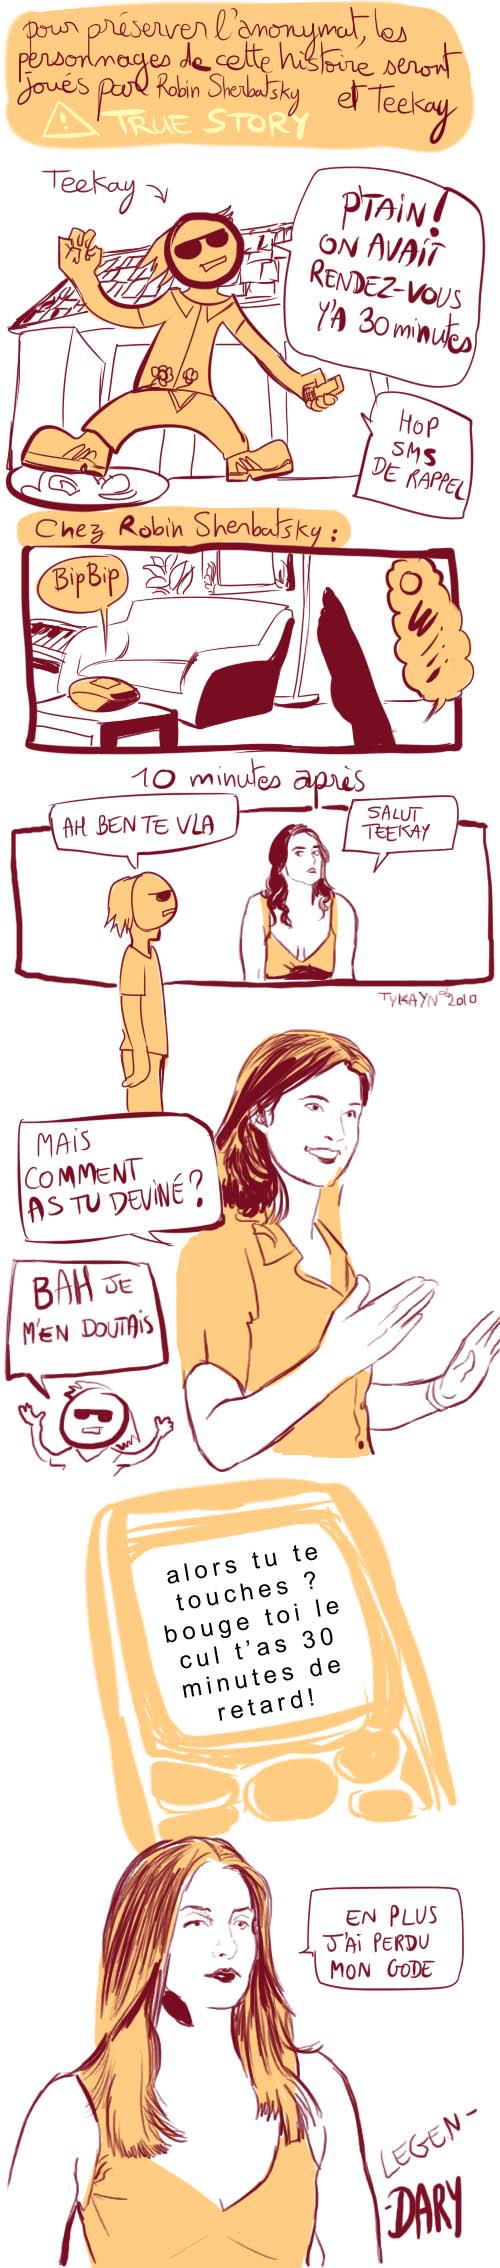 How i met Cobie Smulders